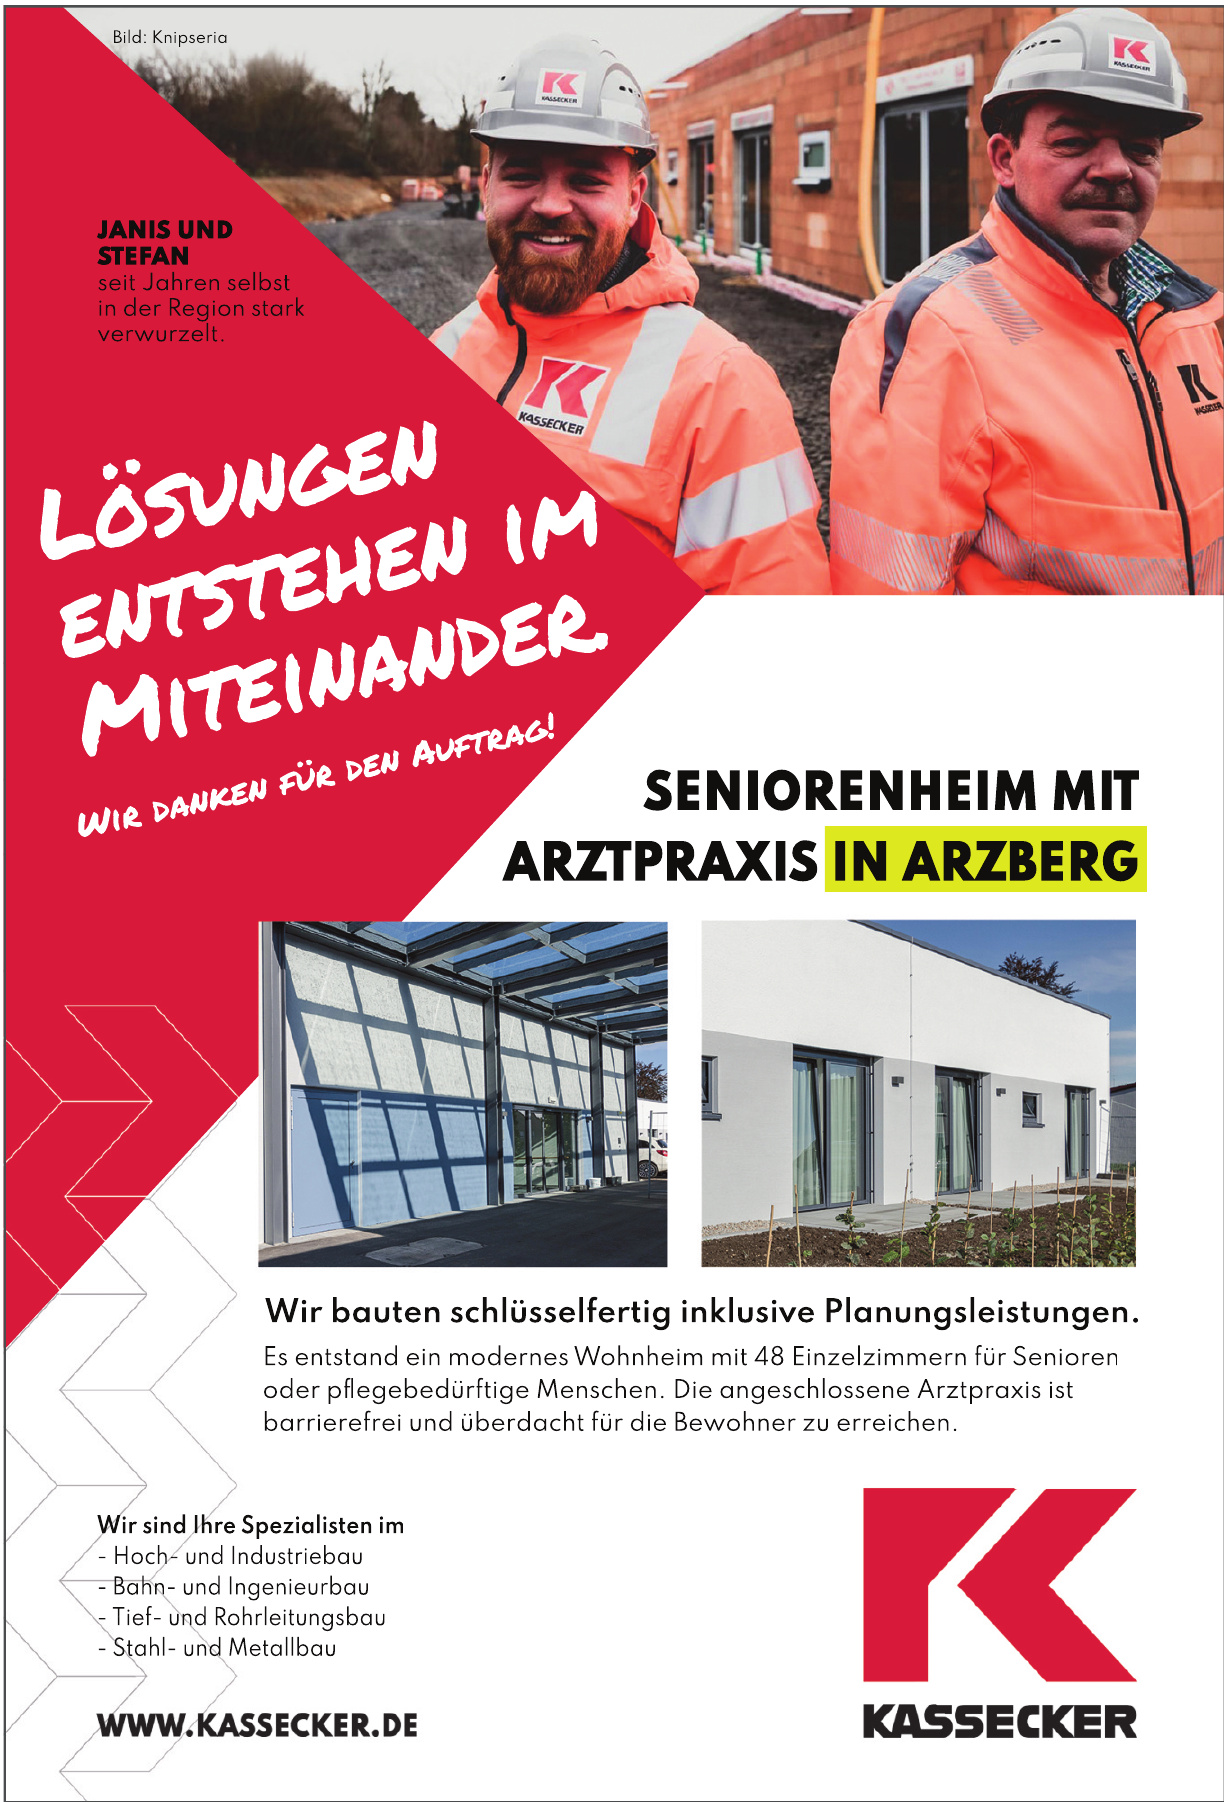 Kassecker GmbH